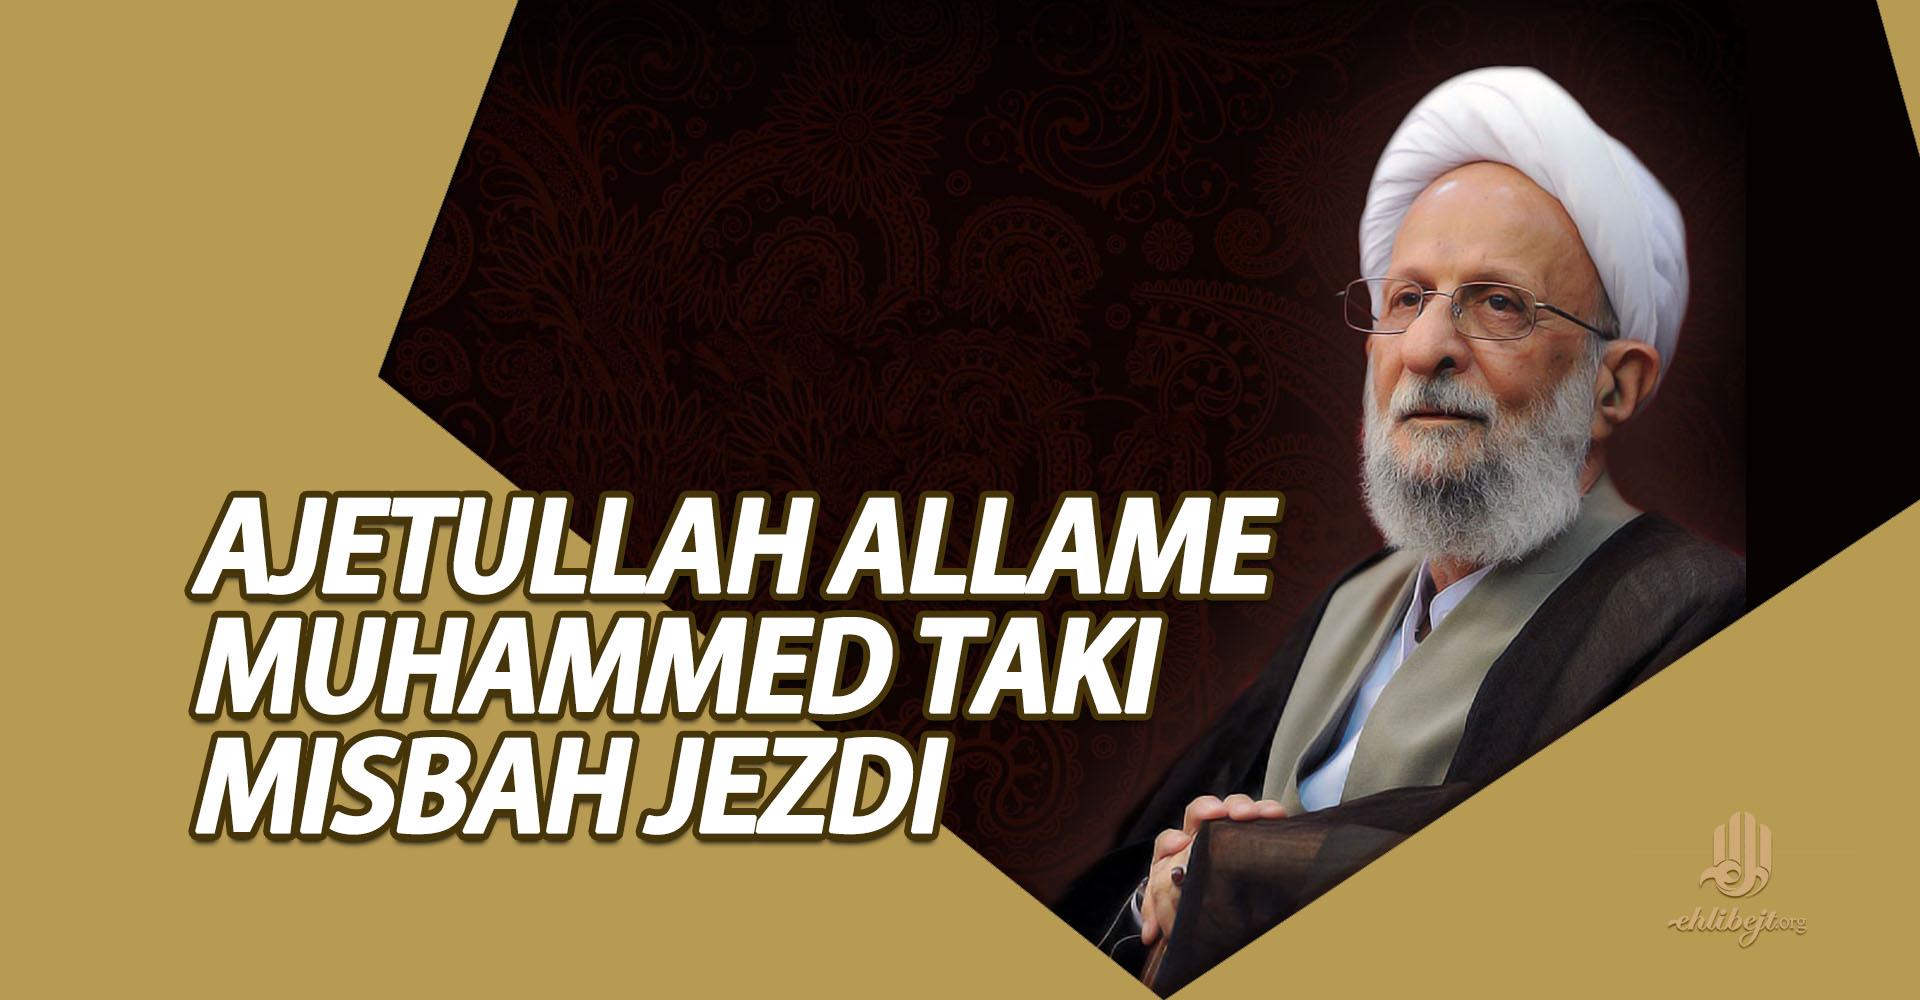 Ajetullah allame Muhammed Taki Misbah Jezdi